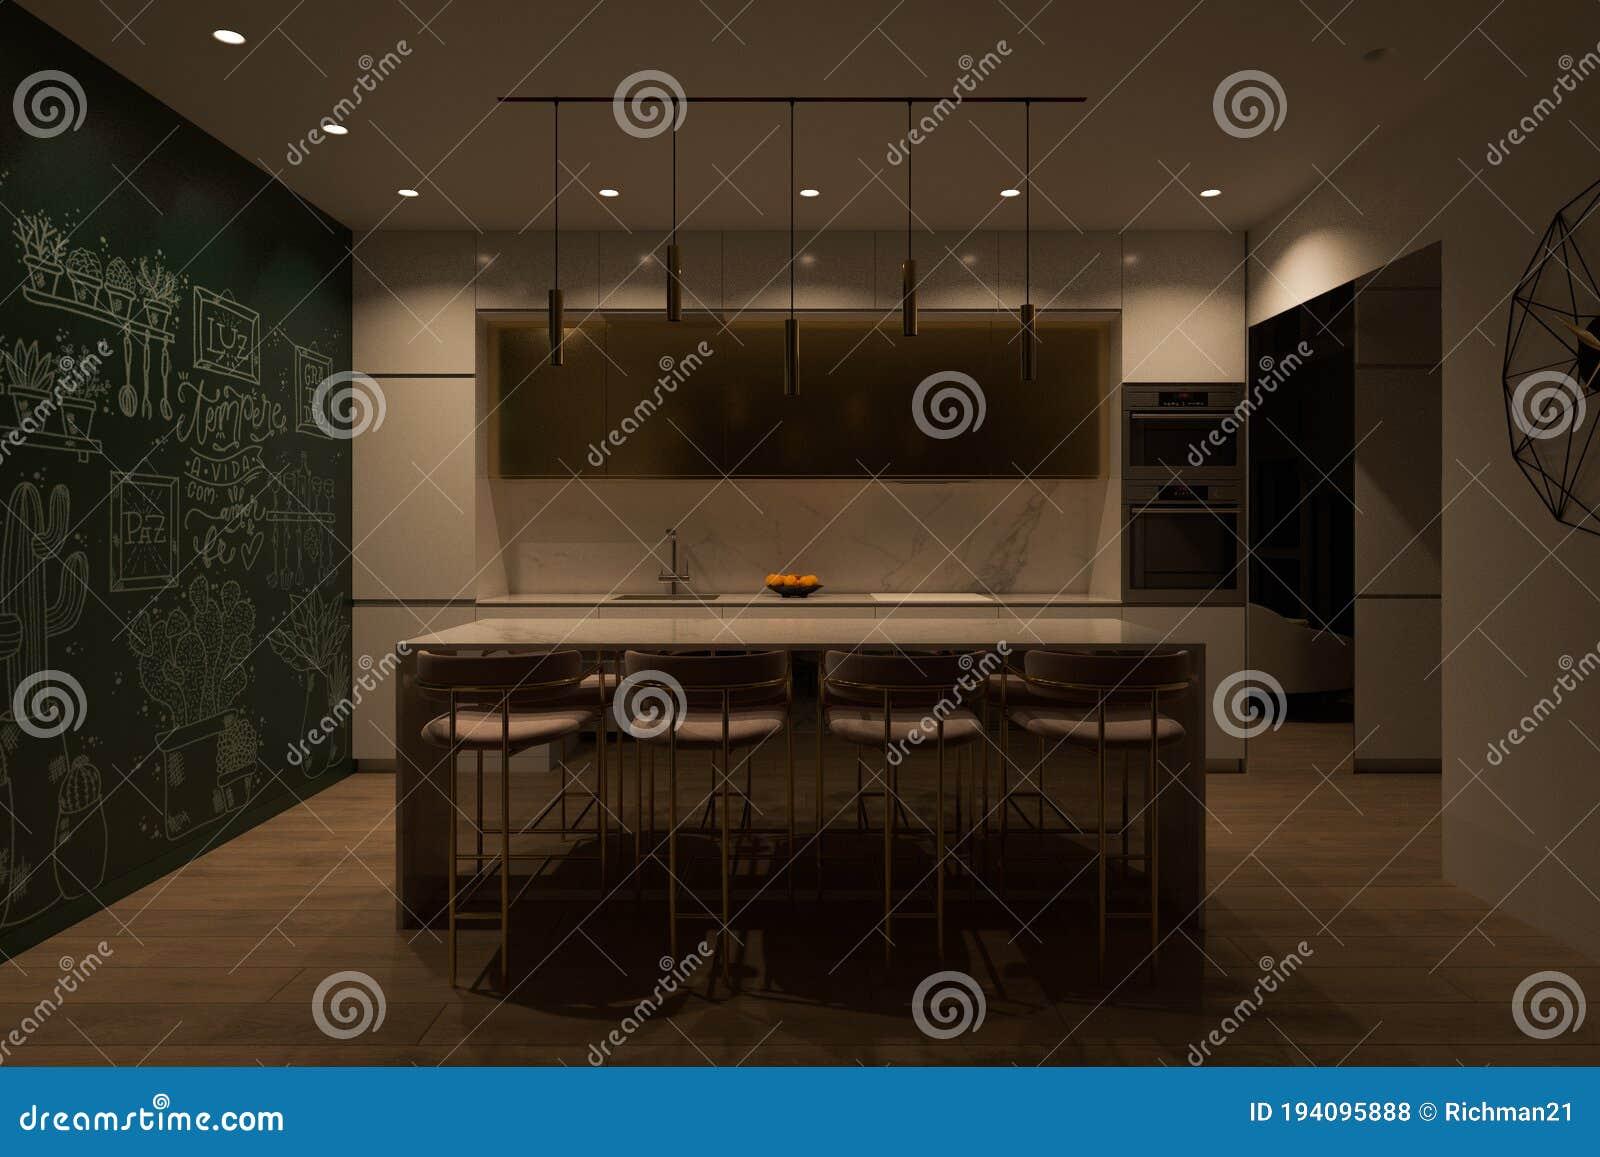 3d Render Kitchen Interior Design Cooking Island And Led Lighting Stock Illustration Illustration Of Dining Cooking 194095888